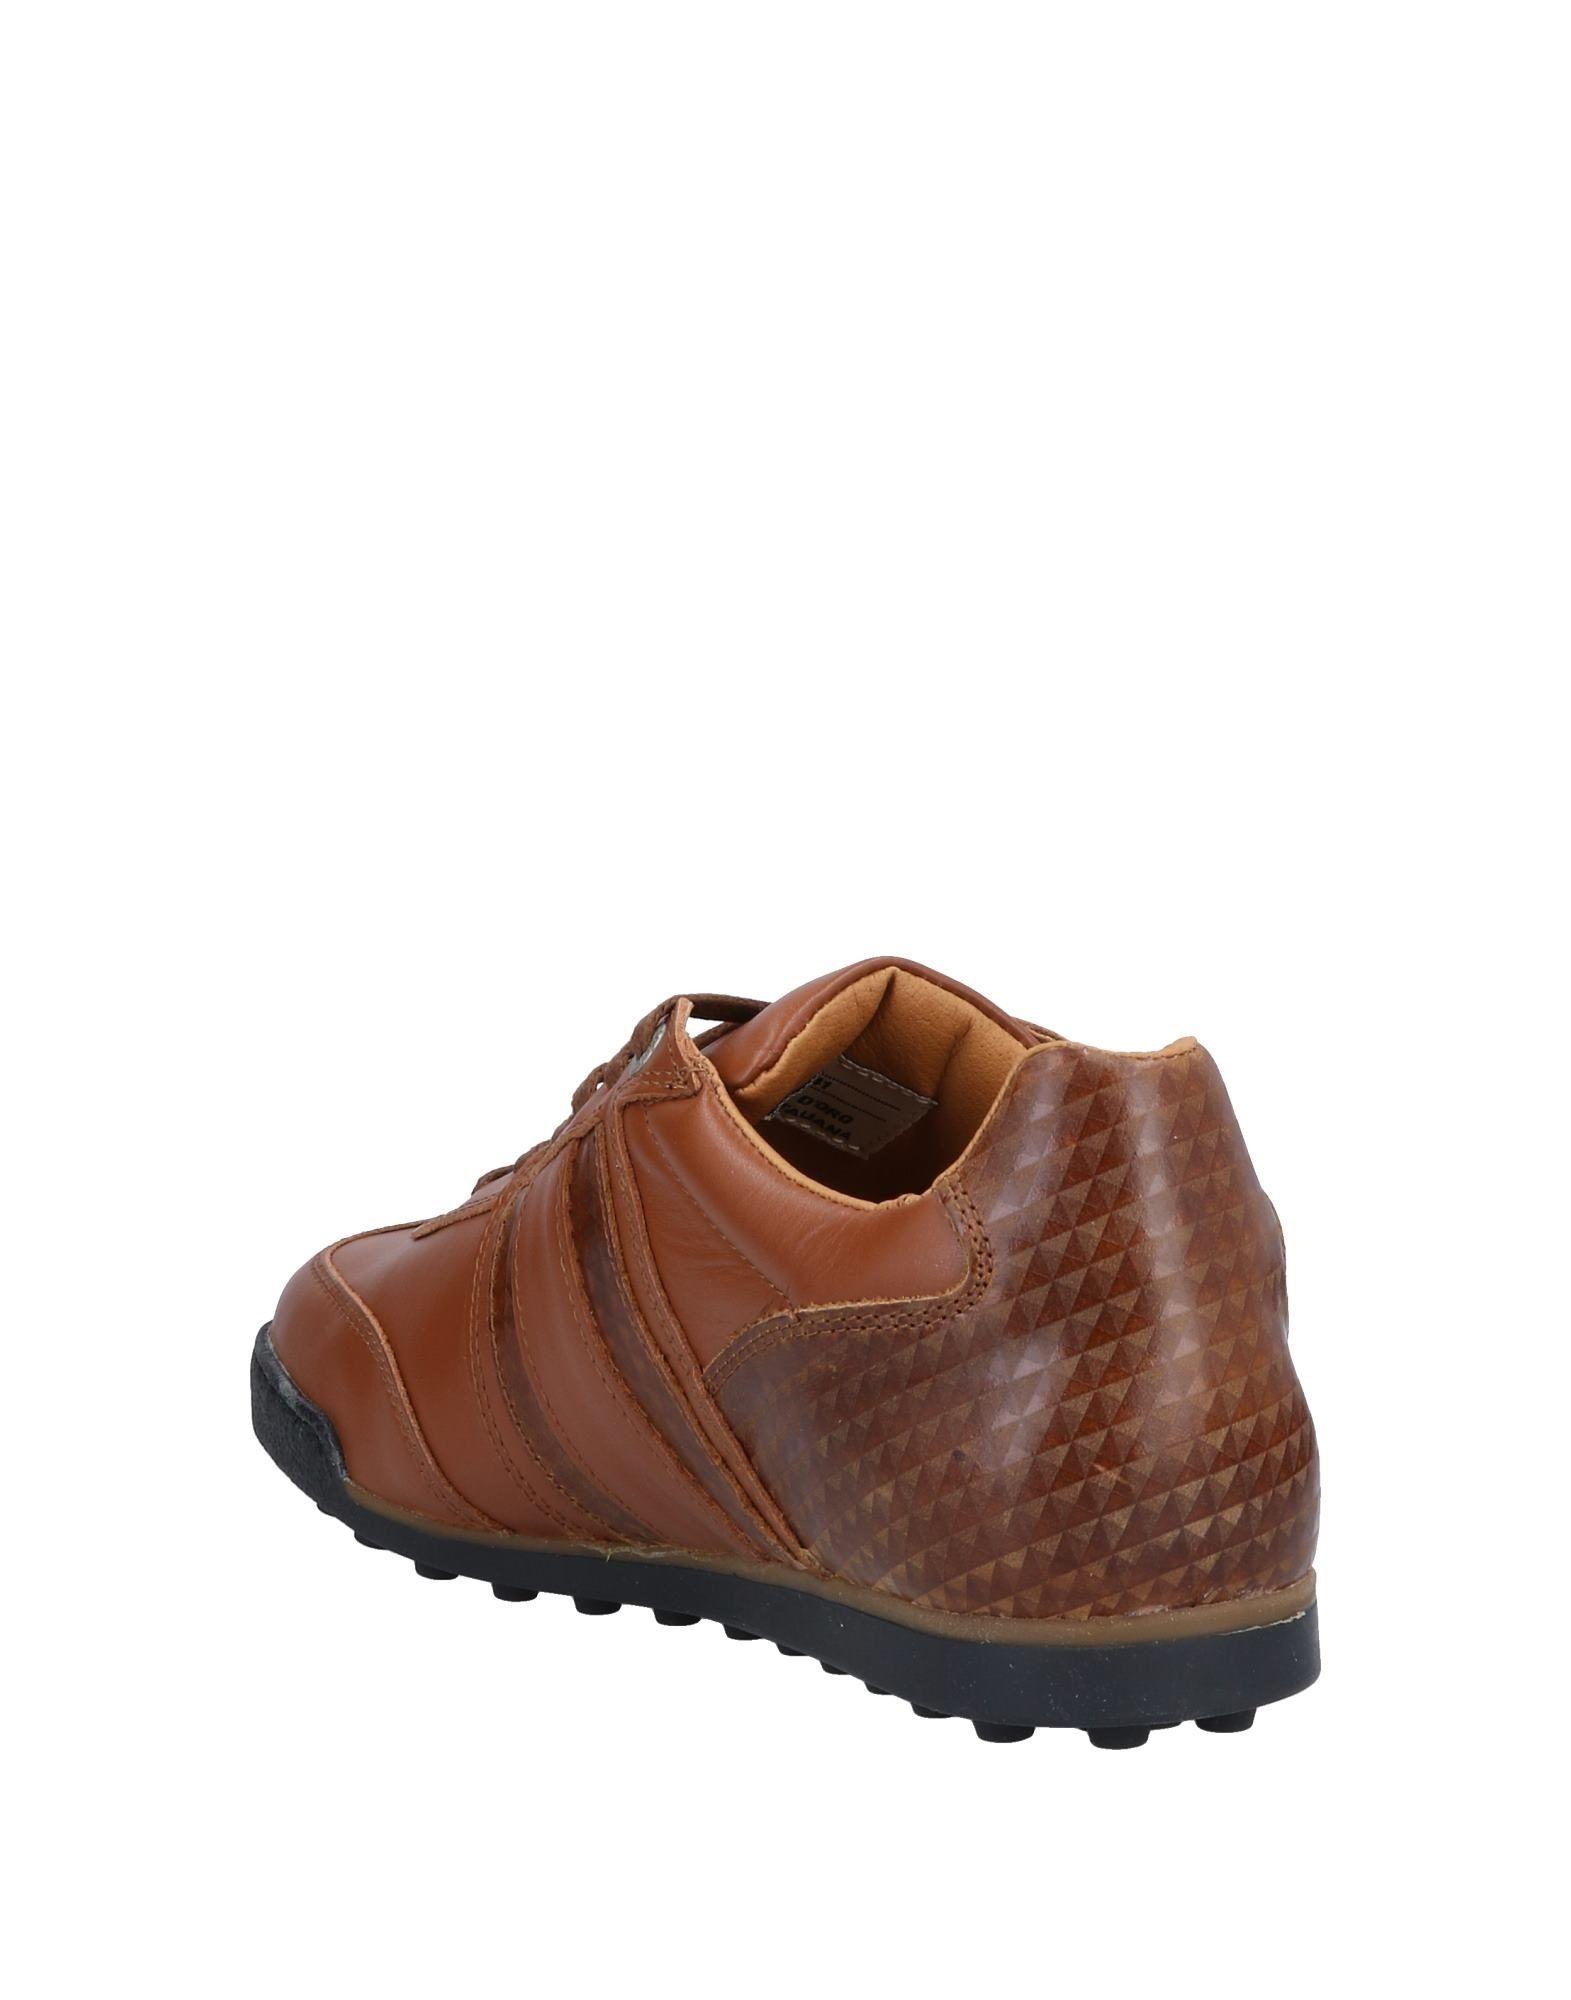 Rabatt echte Turnschuhes Schuhe Pantofola D oro Turnschuhes echte Herren 11575964GU 4a9cc0